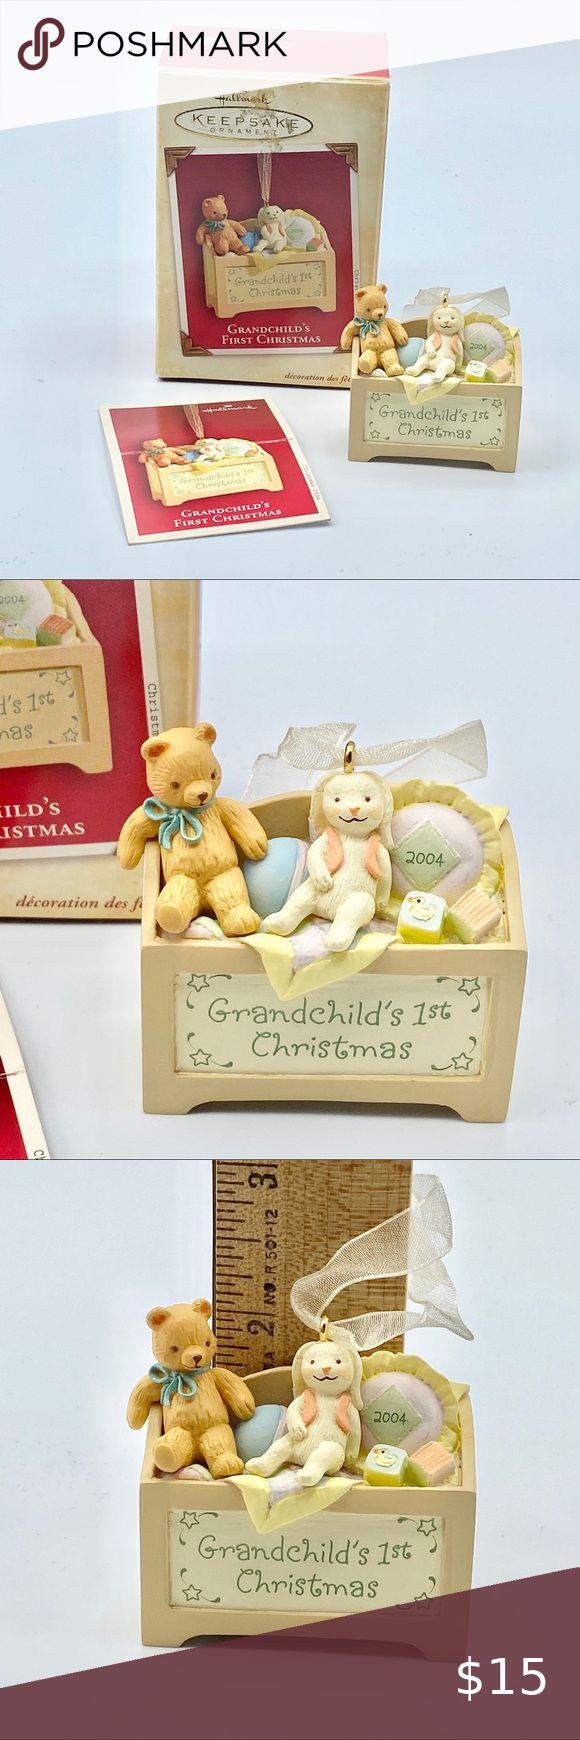 2004 Hallmark Grandchild's 1st Christmas Ornament in 2020